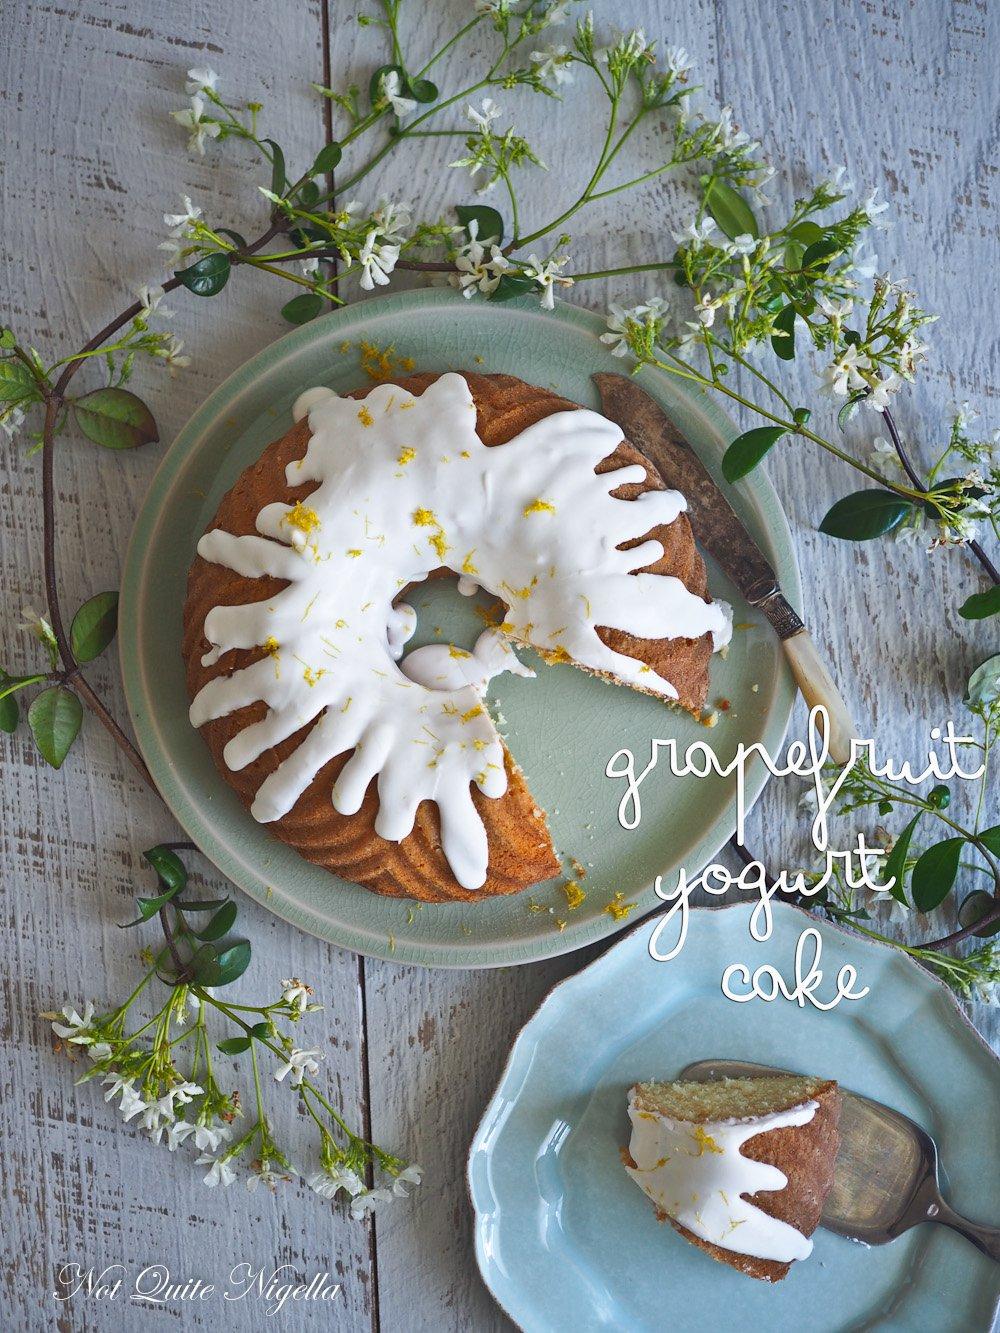 Persephone The Zingy Grapefruit Yogurt Cake